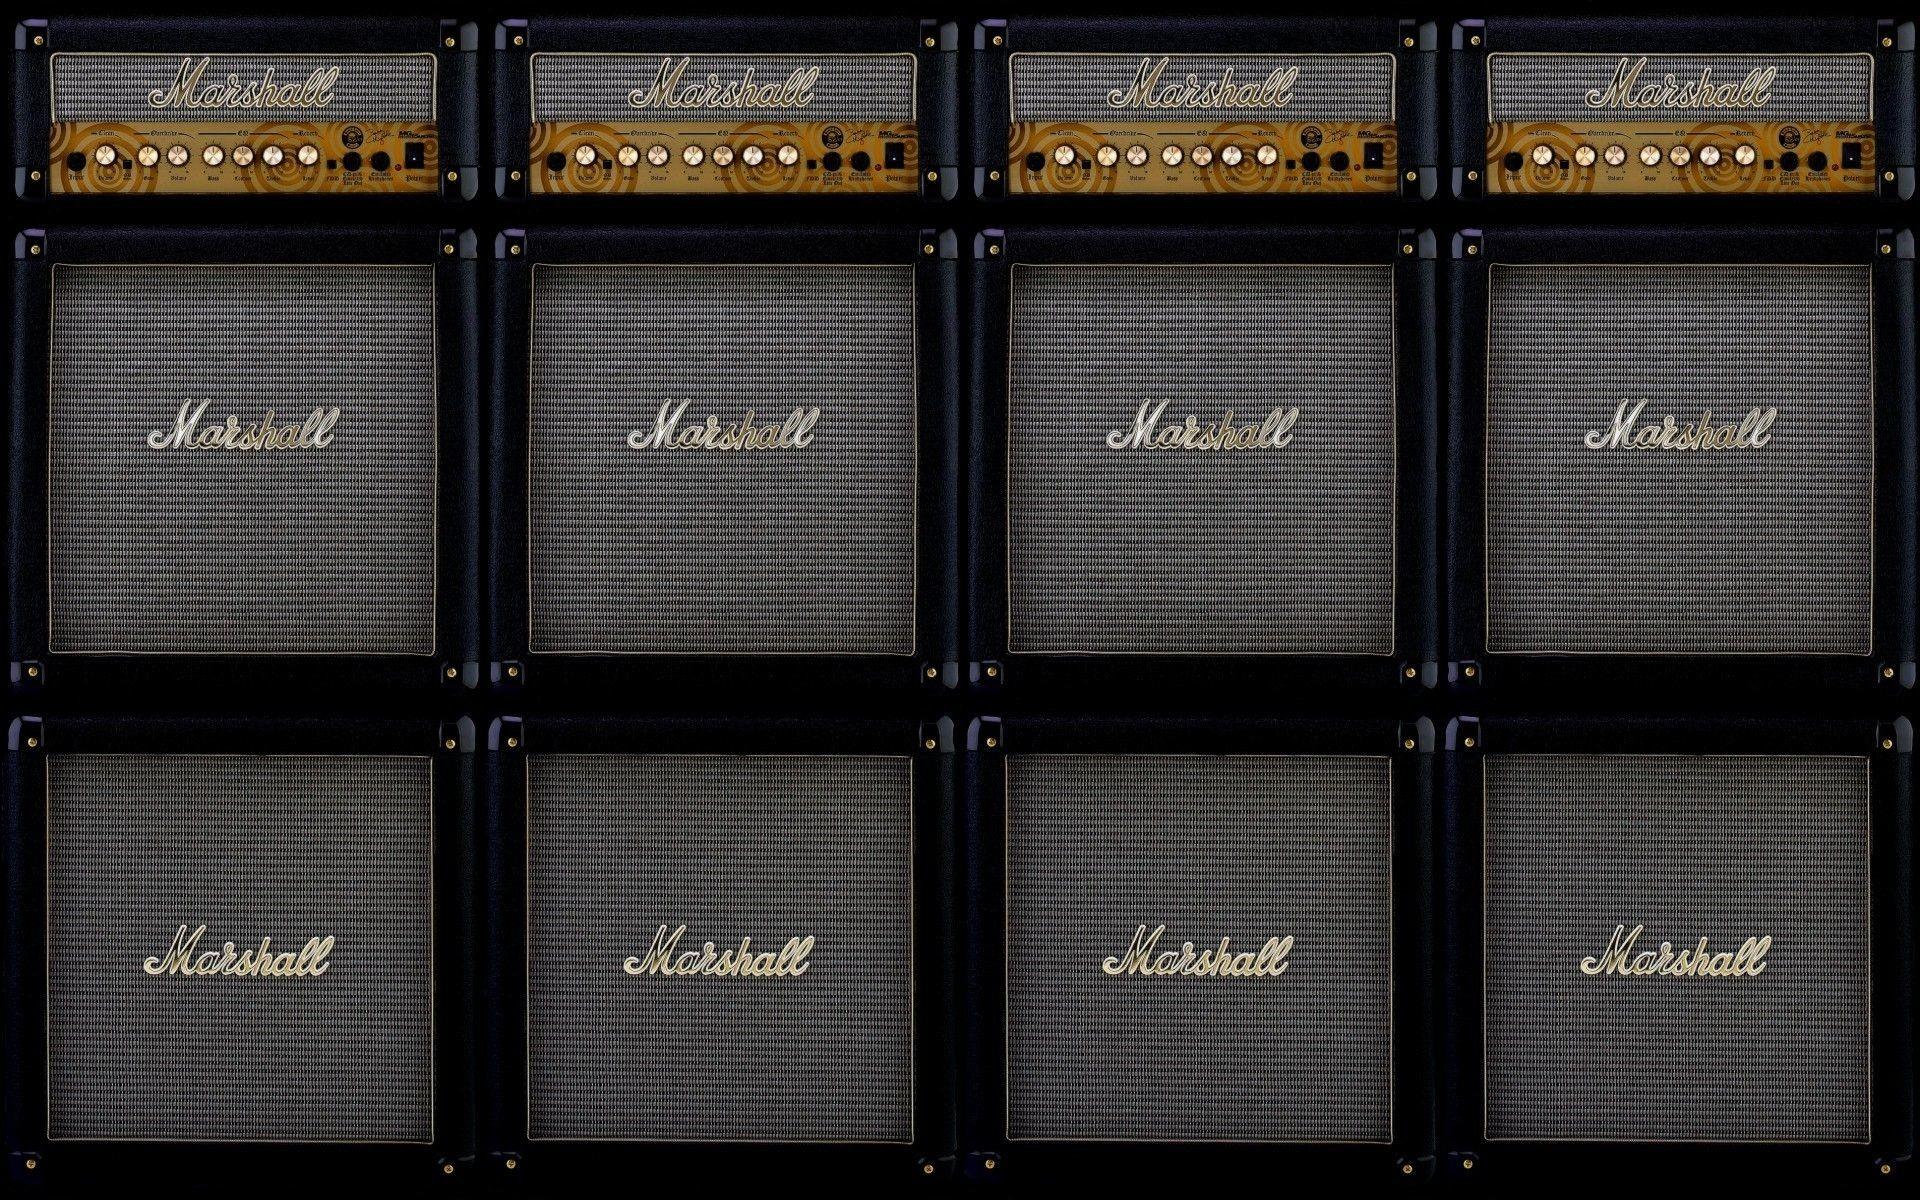 Entertainment music guitars strings musical instuments amplifier .